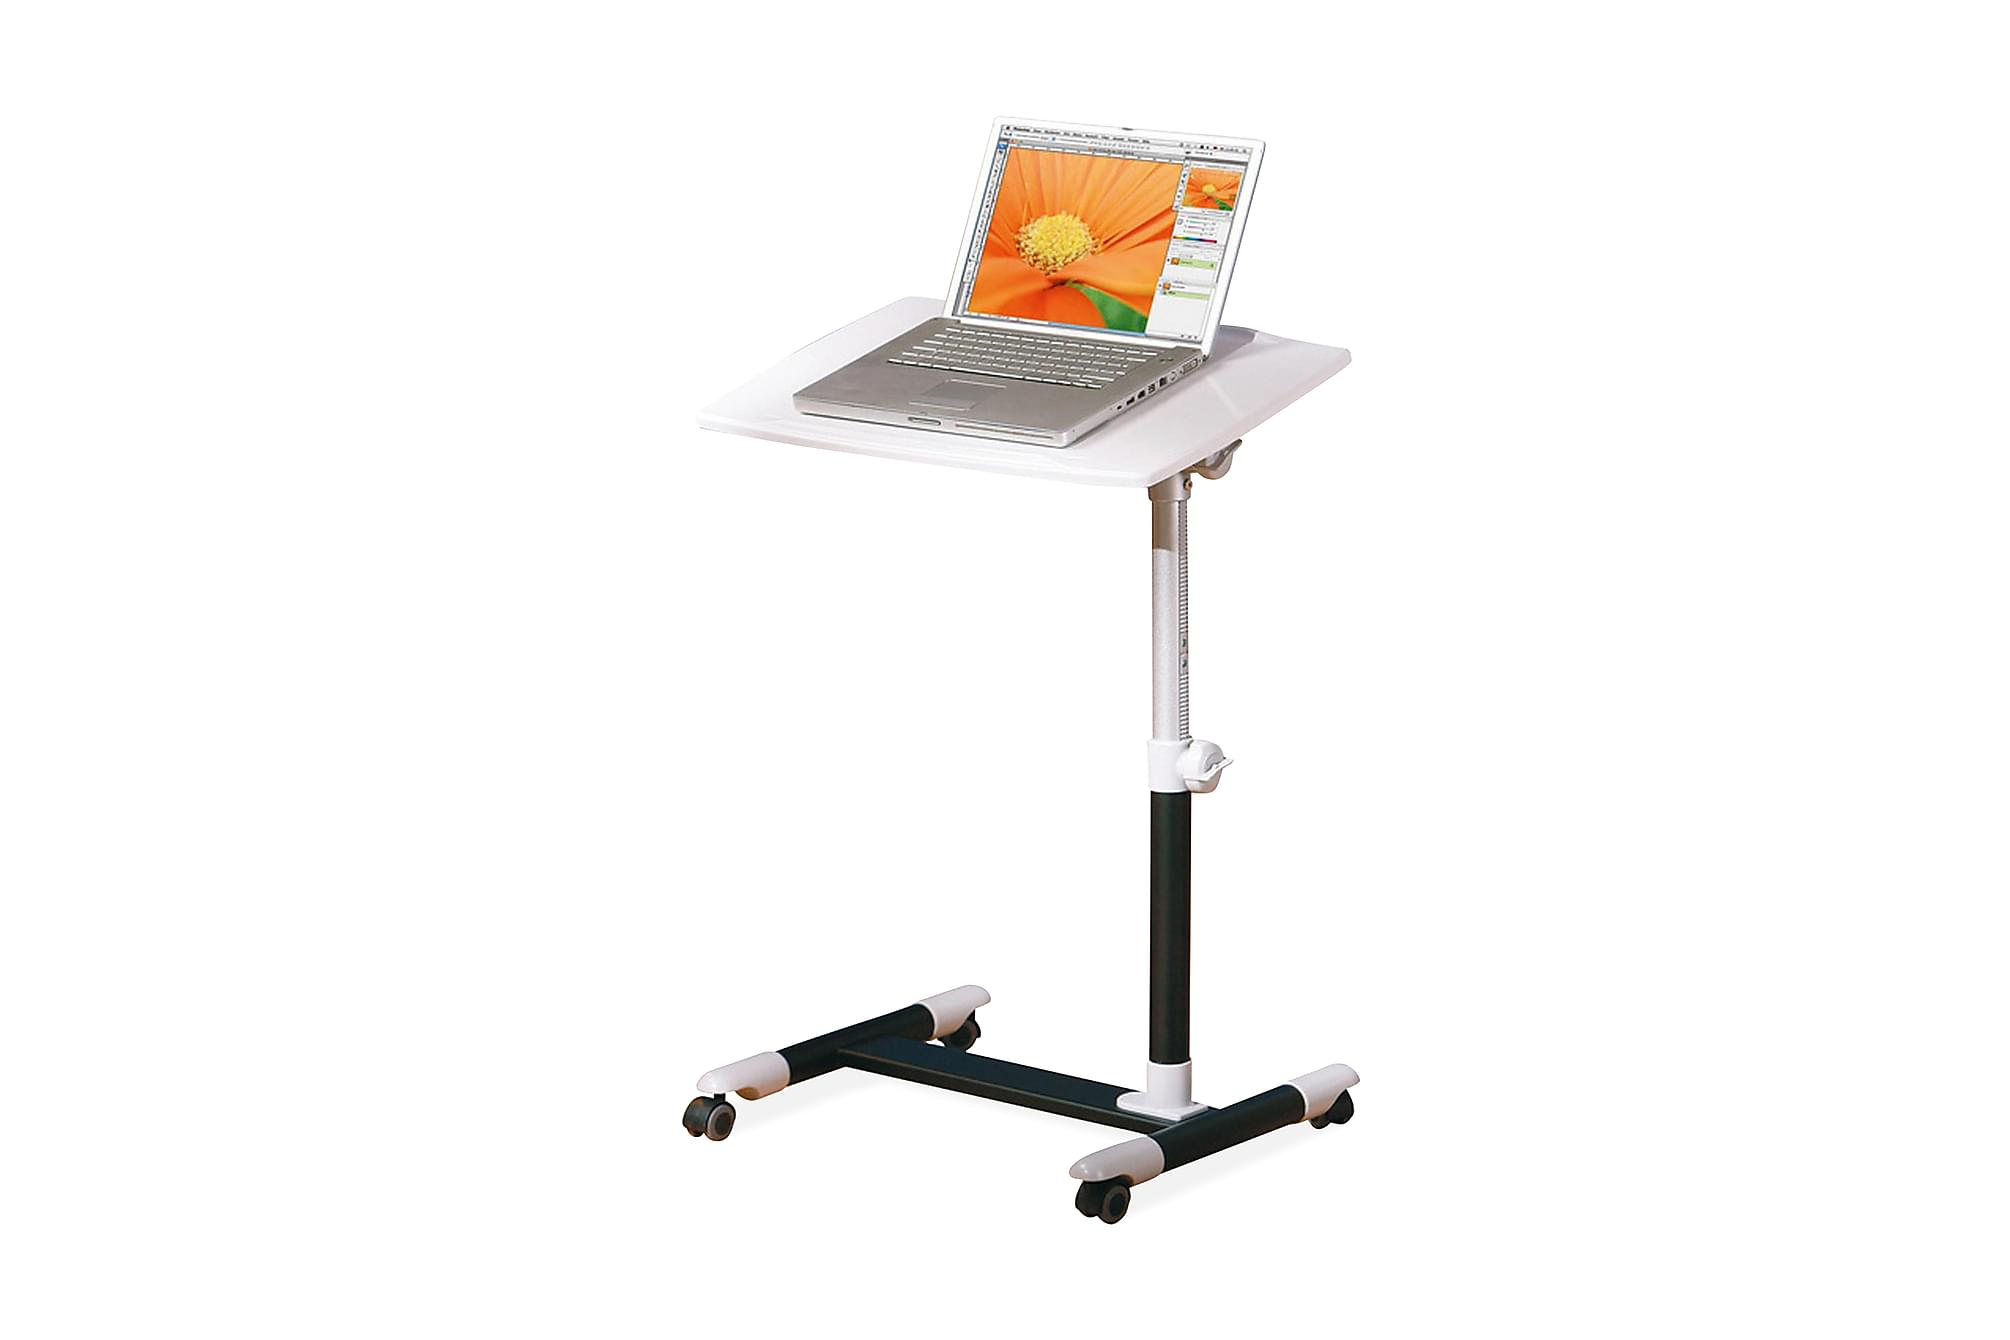 ALEXIS Datorbord 60 Vit, Skrivbord